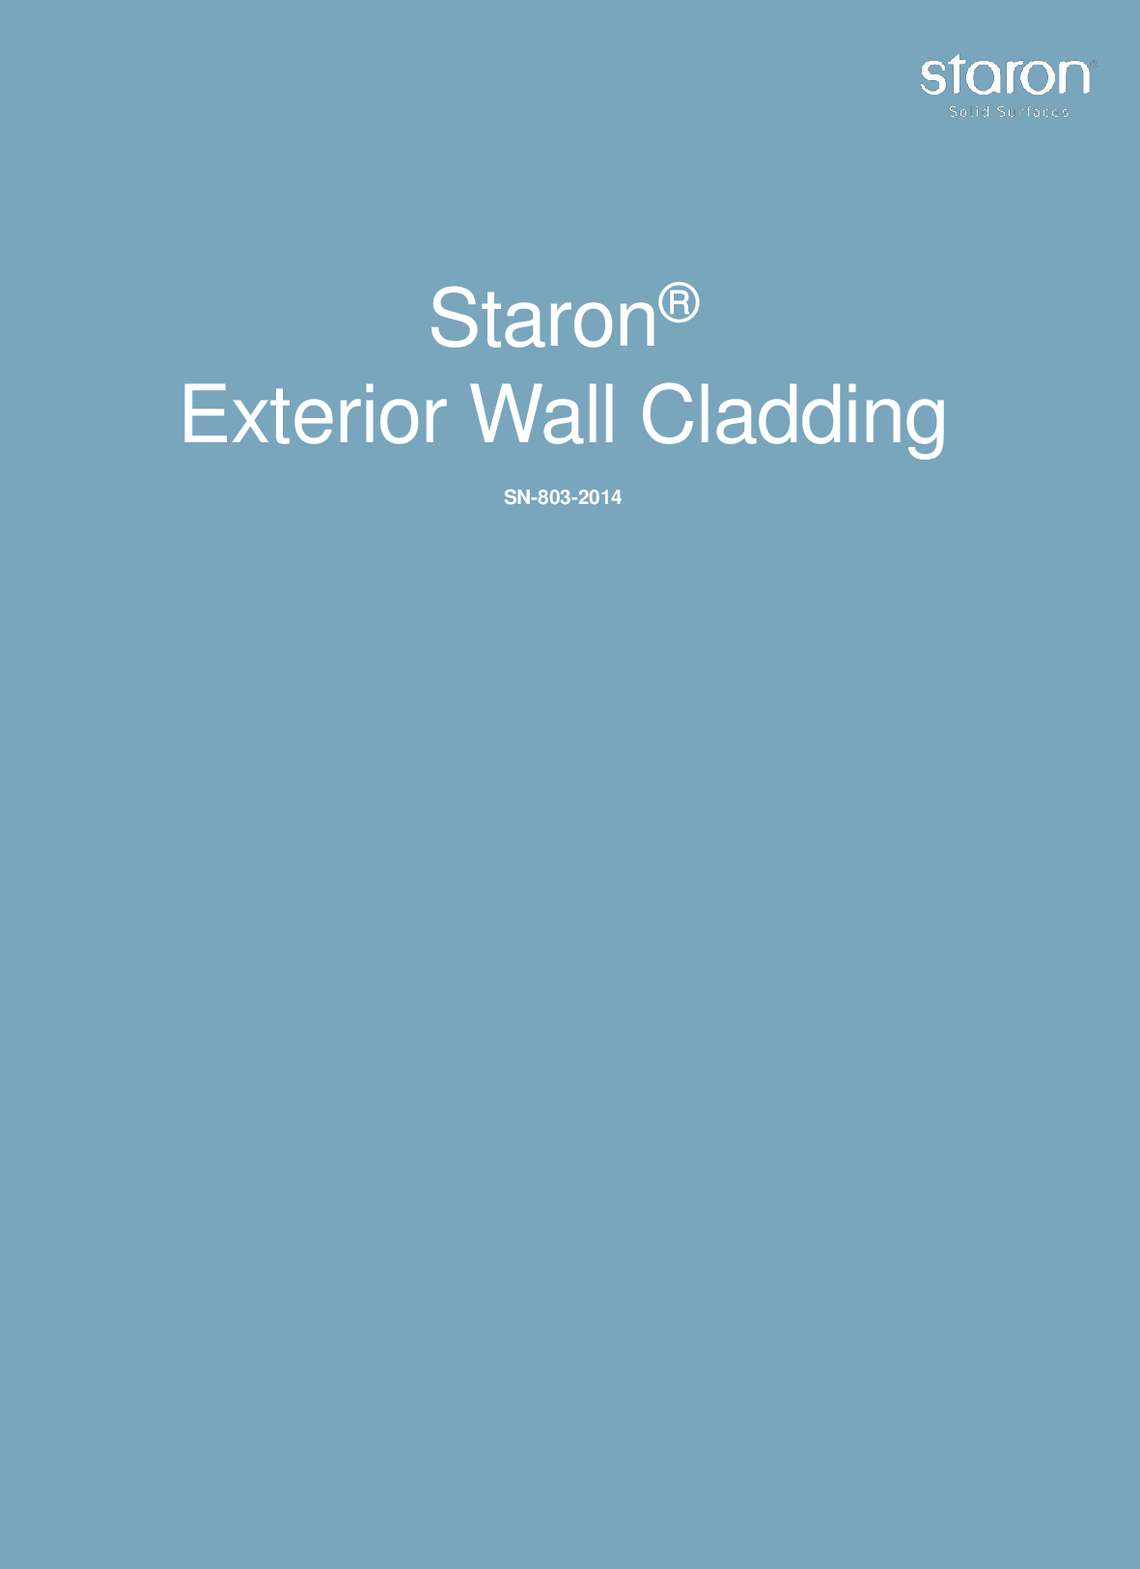 STARON pareti esterne